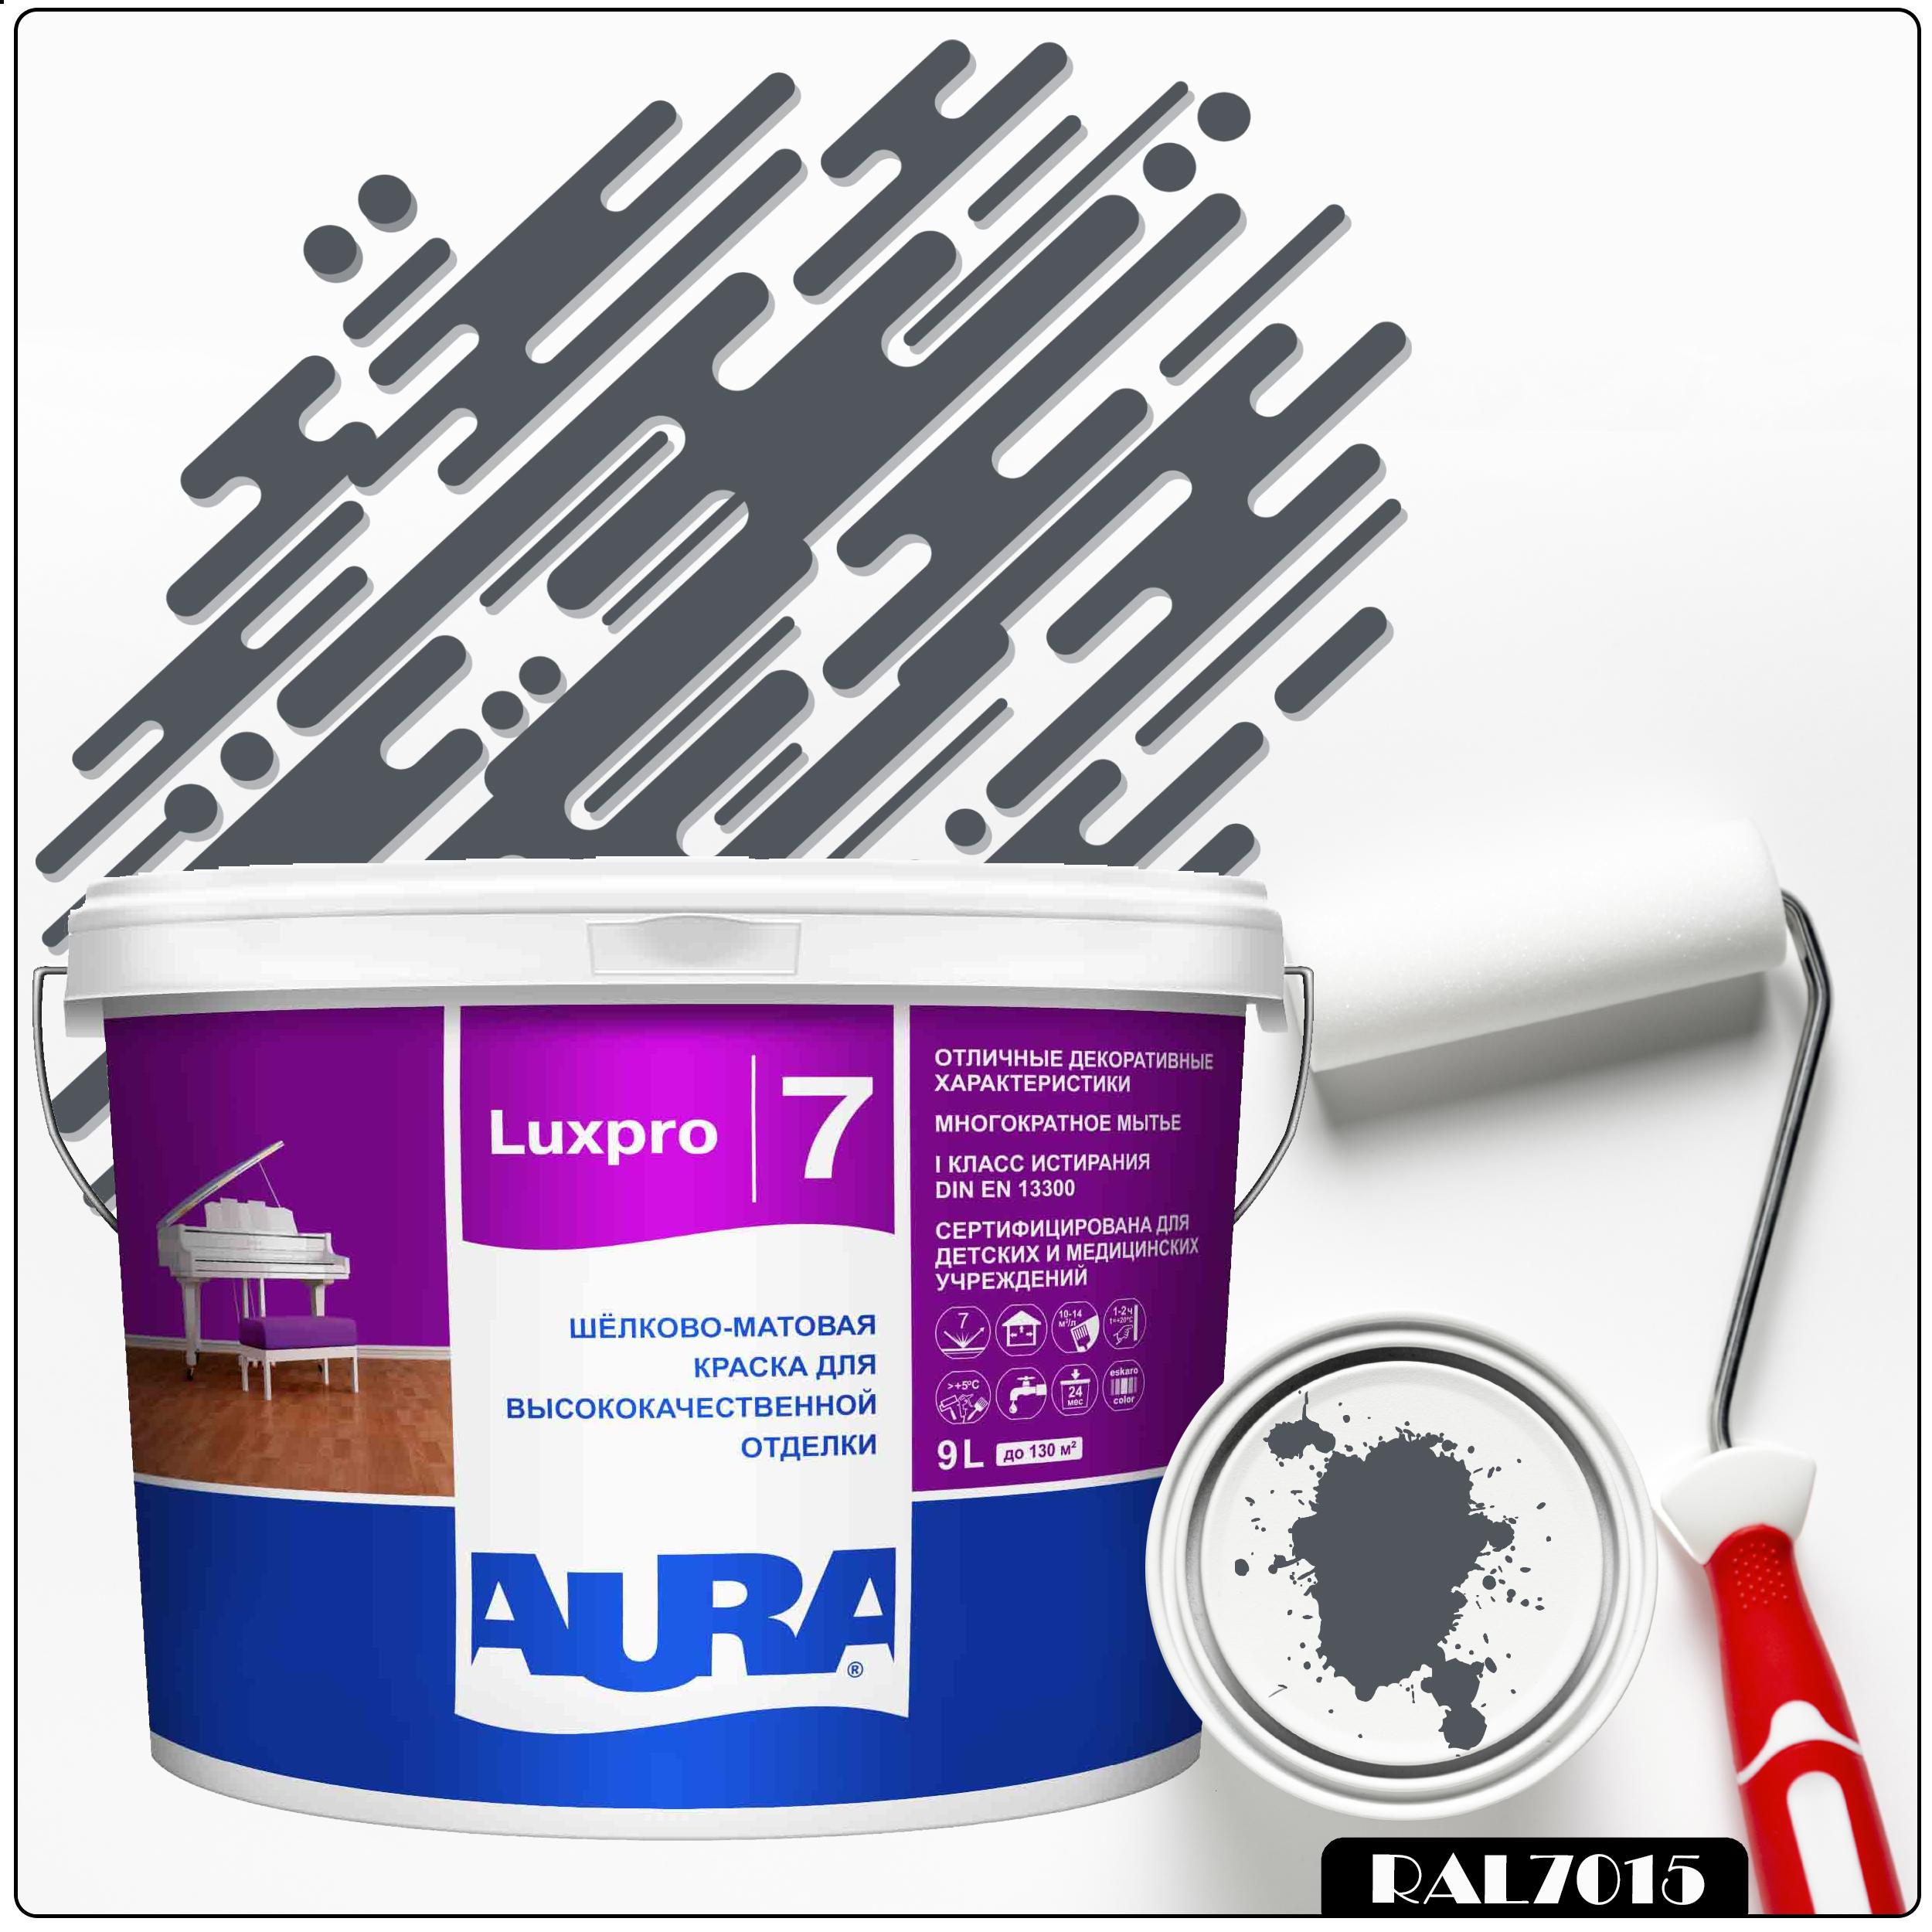 Фото 14 - Краска Aura LuxPRO 7, RAL 7015 Серый сланец, латексная, шелково-матовая, интерьерная, 9л, Аура.